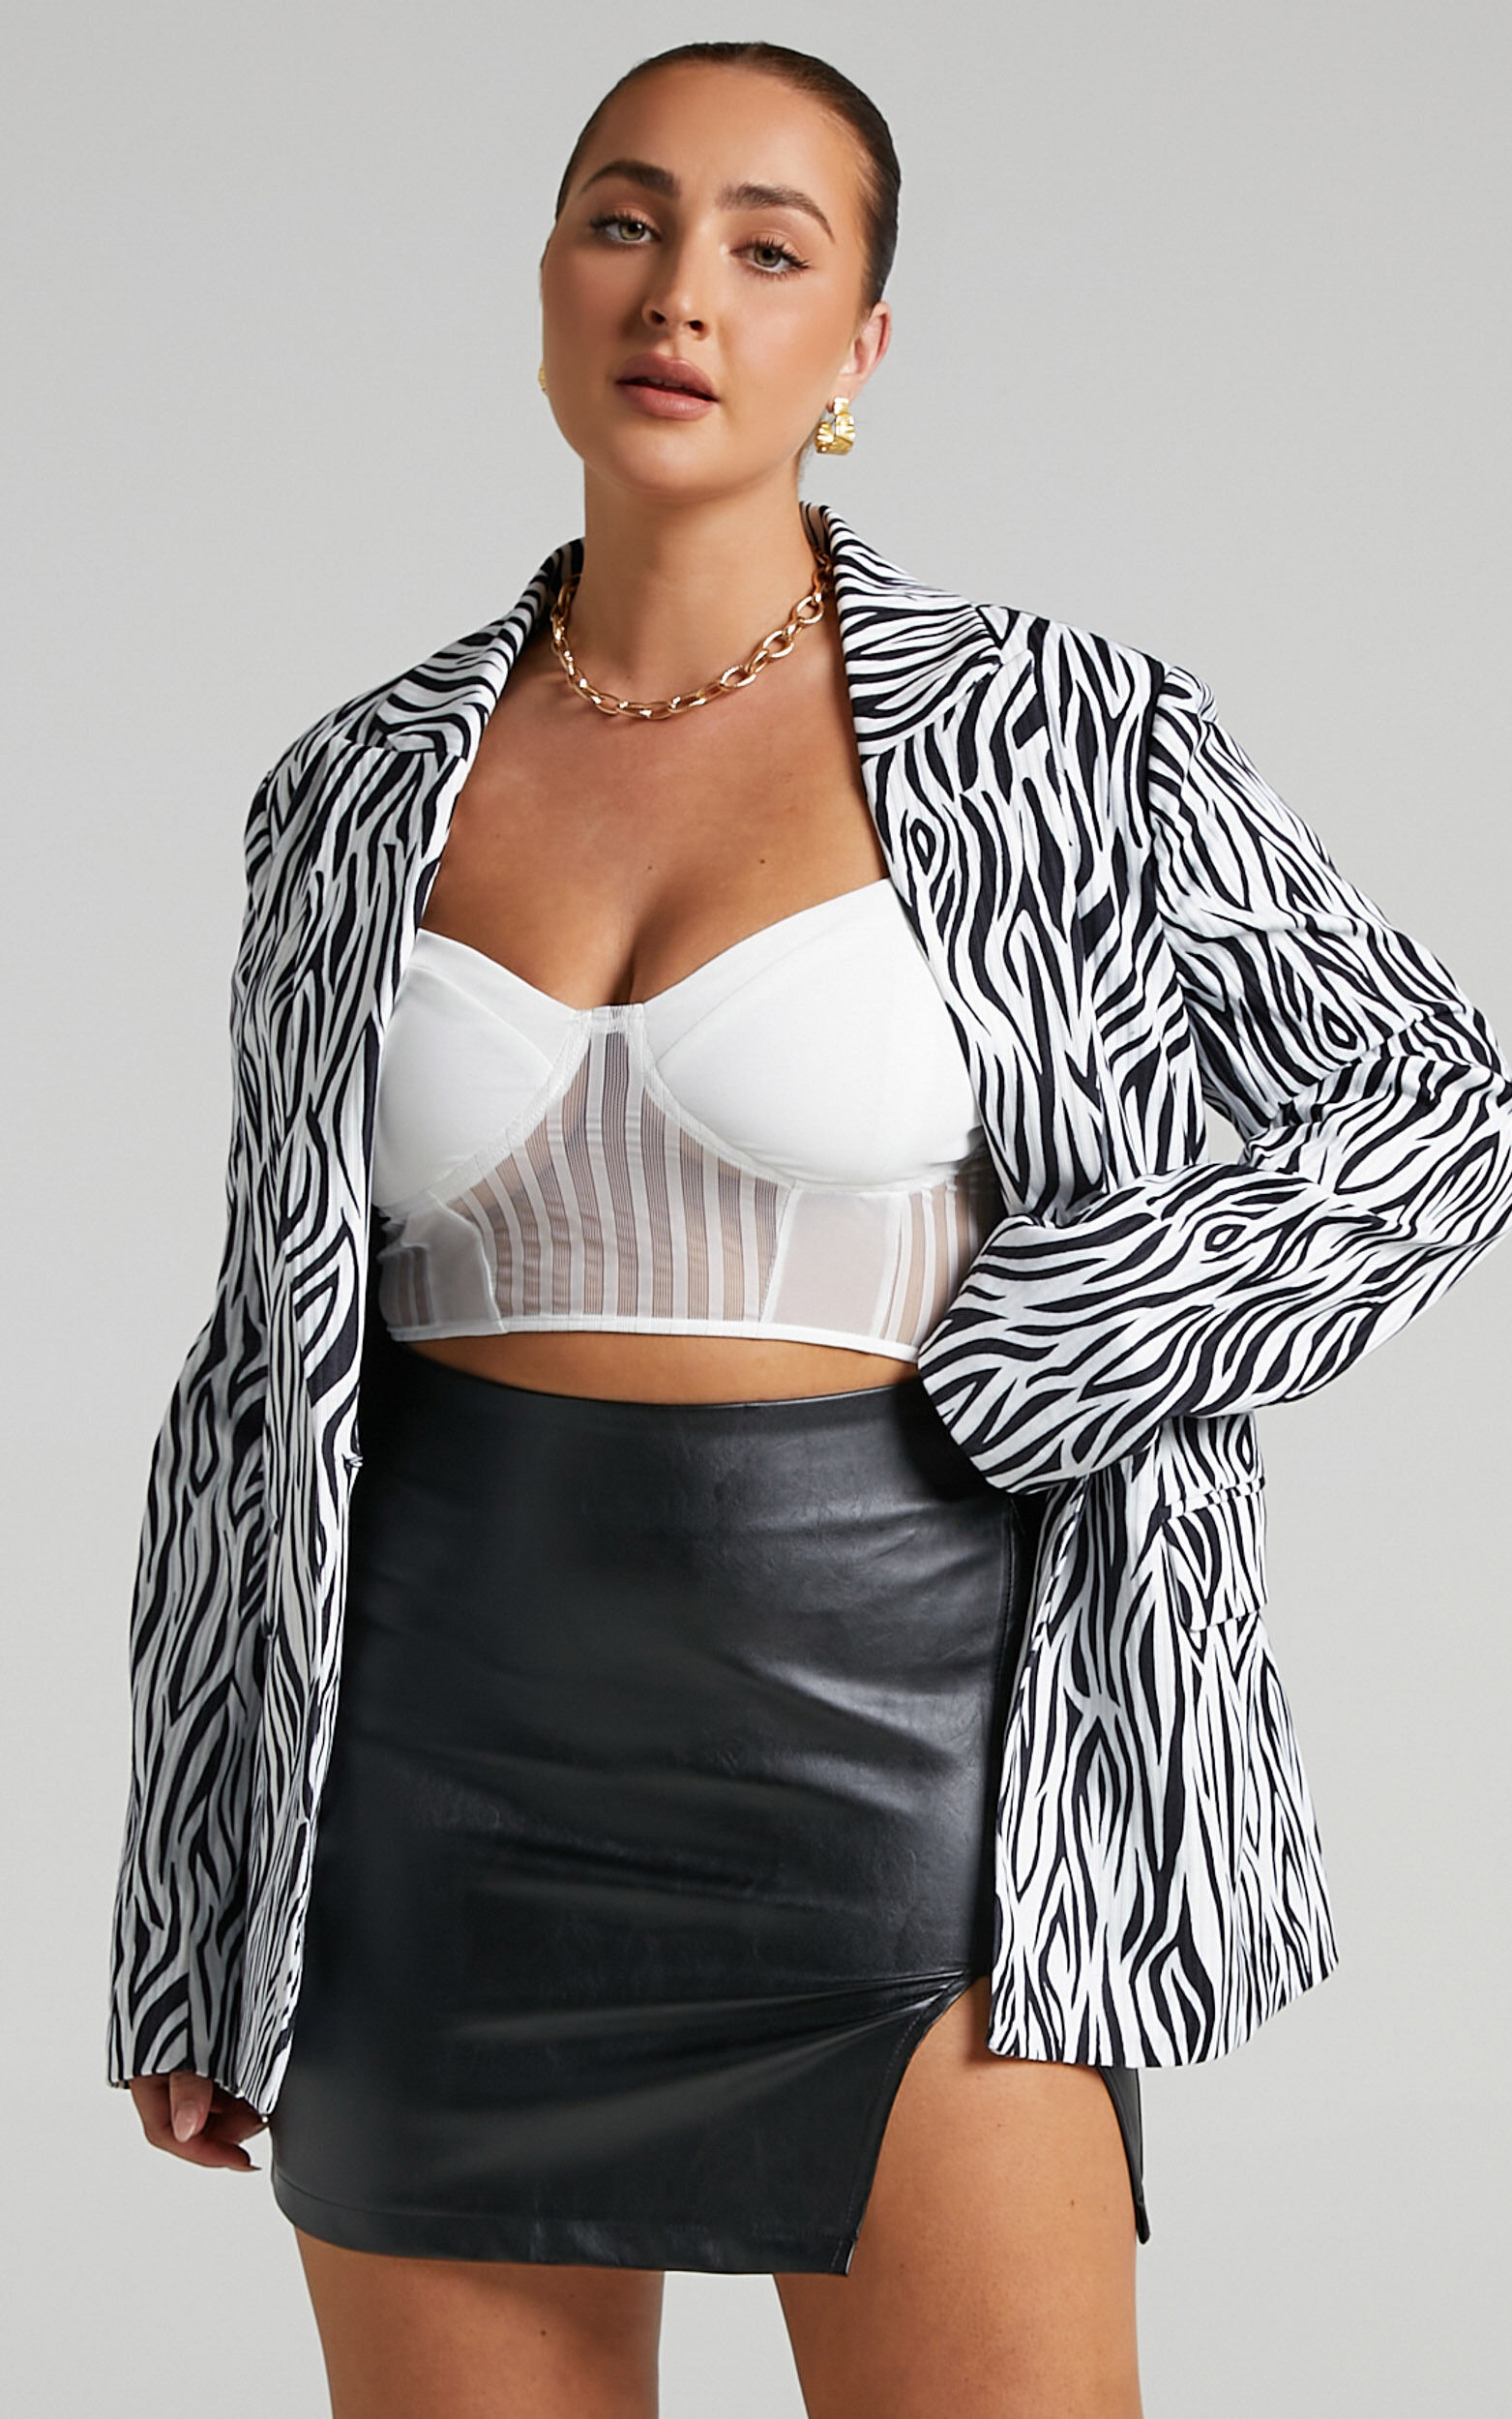 Robbia Blazer in Zebra Print - 04, MLT1, super-hi-res image number null